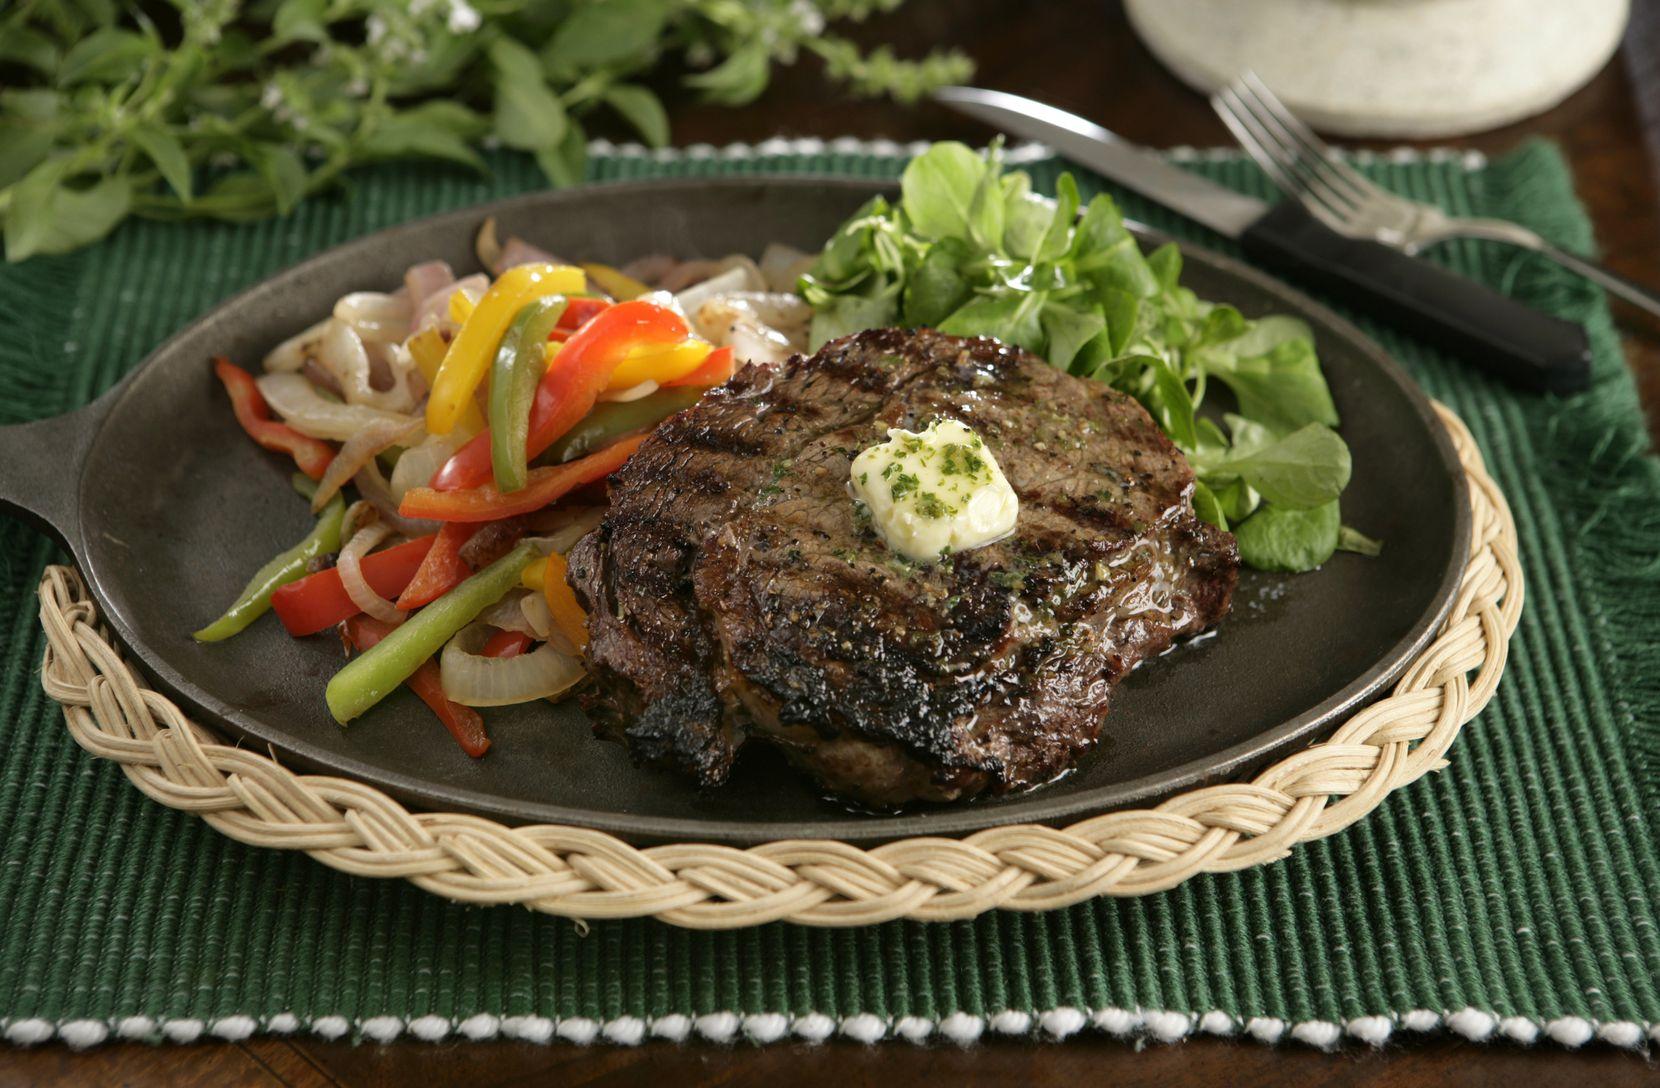 A beautifully grilled ribeye steak.